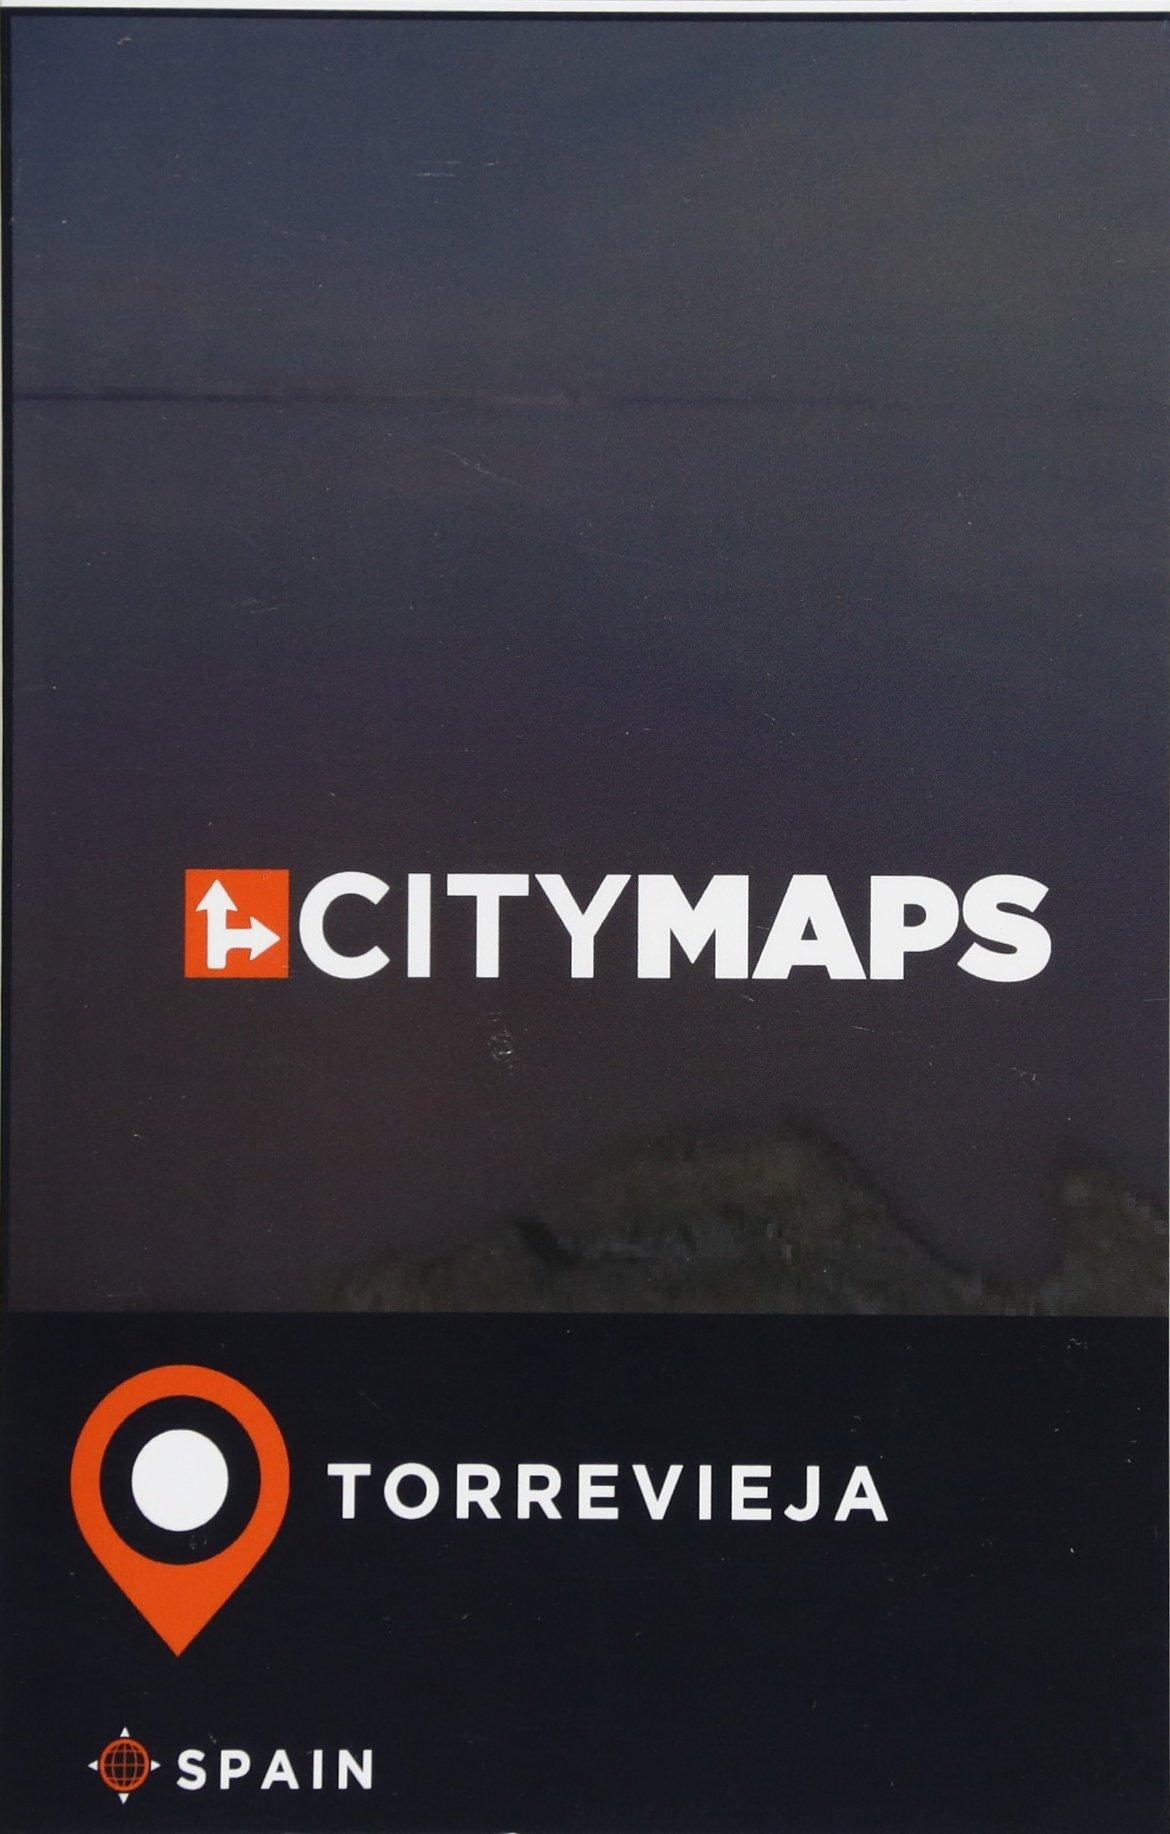 City Maps Torrevieja Spain Amazon Co Uk James Mcfee 9781548795566